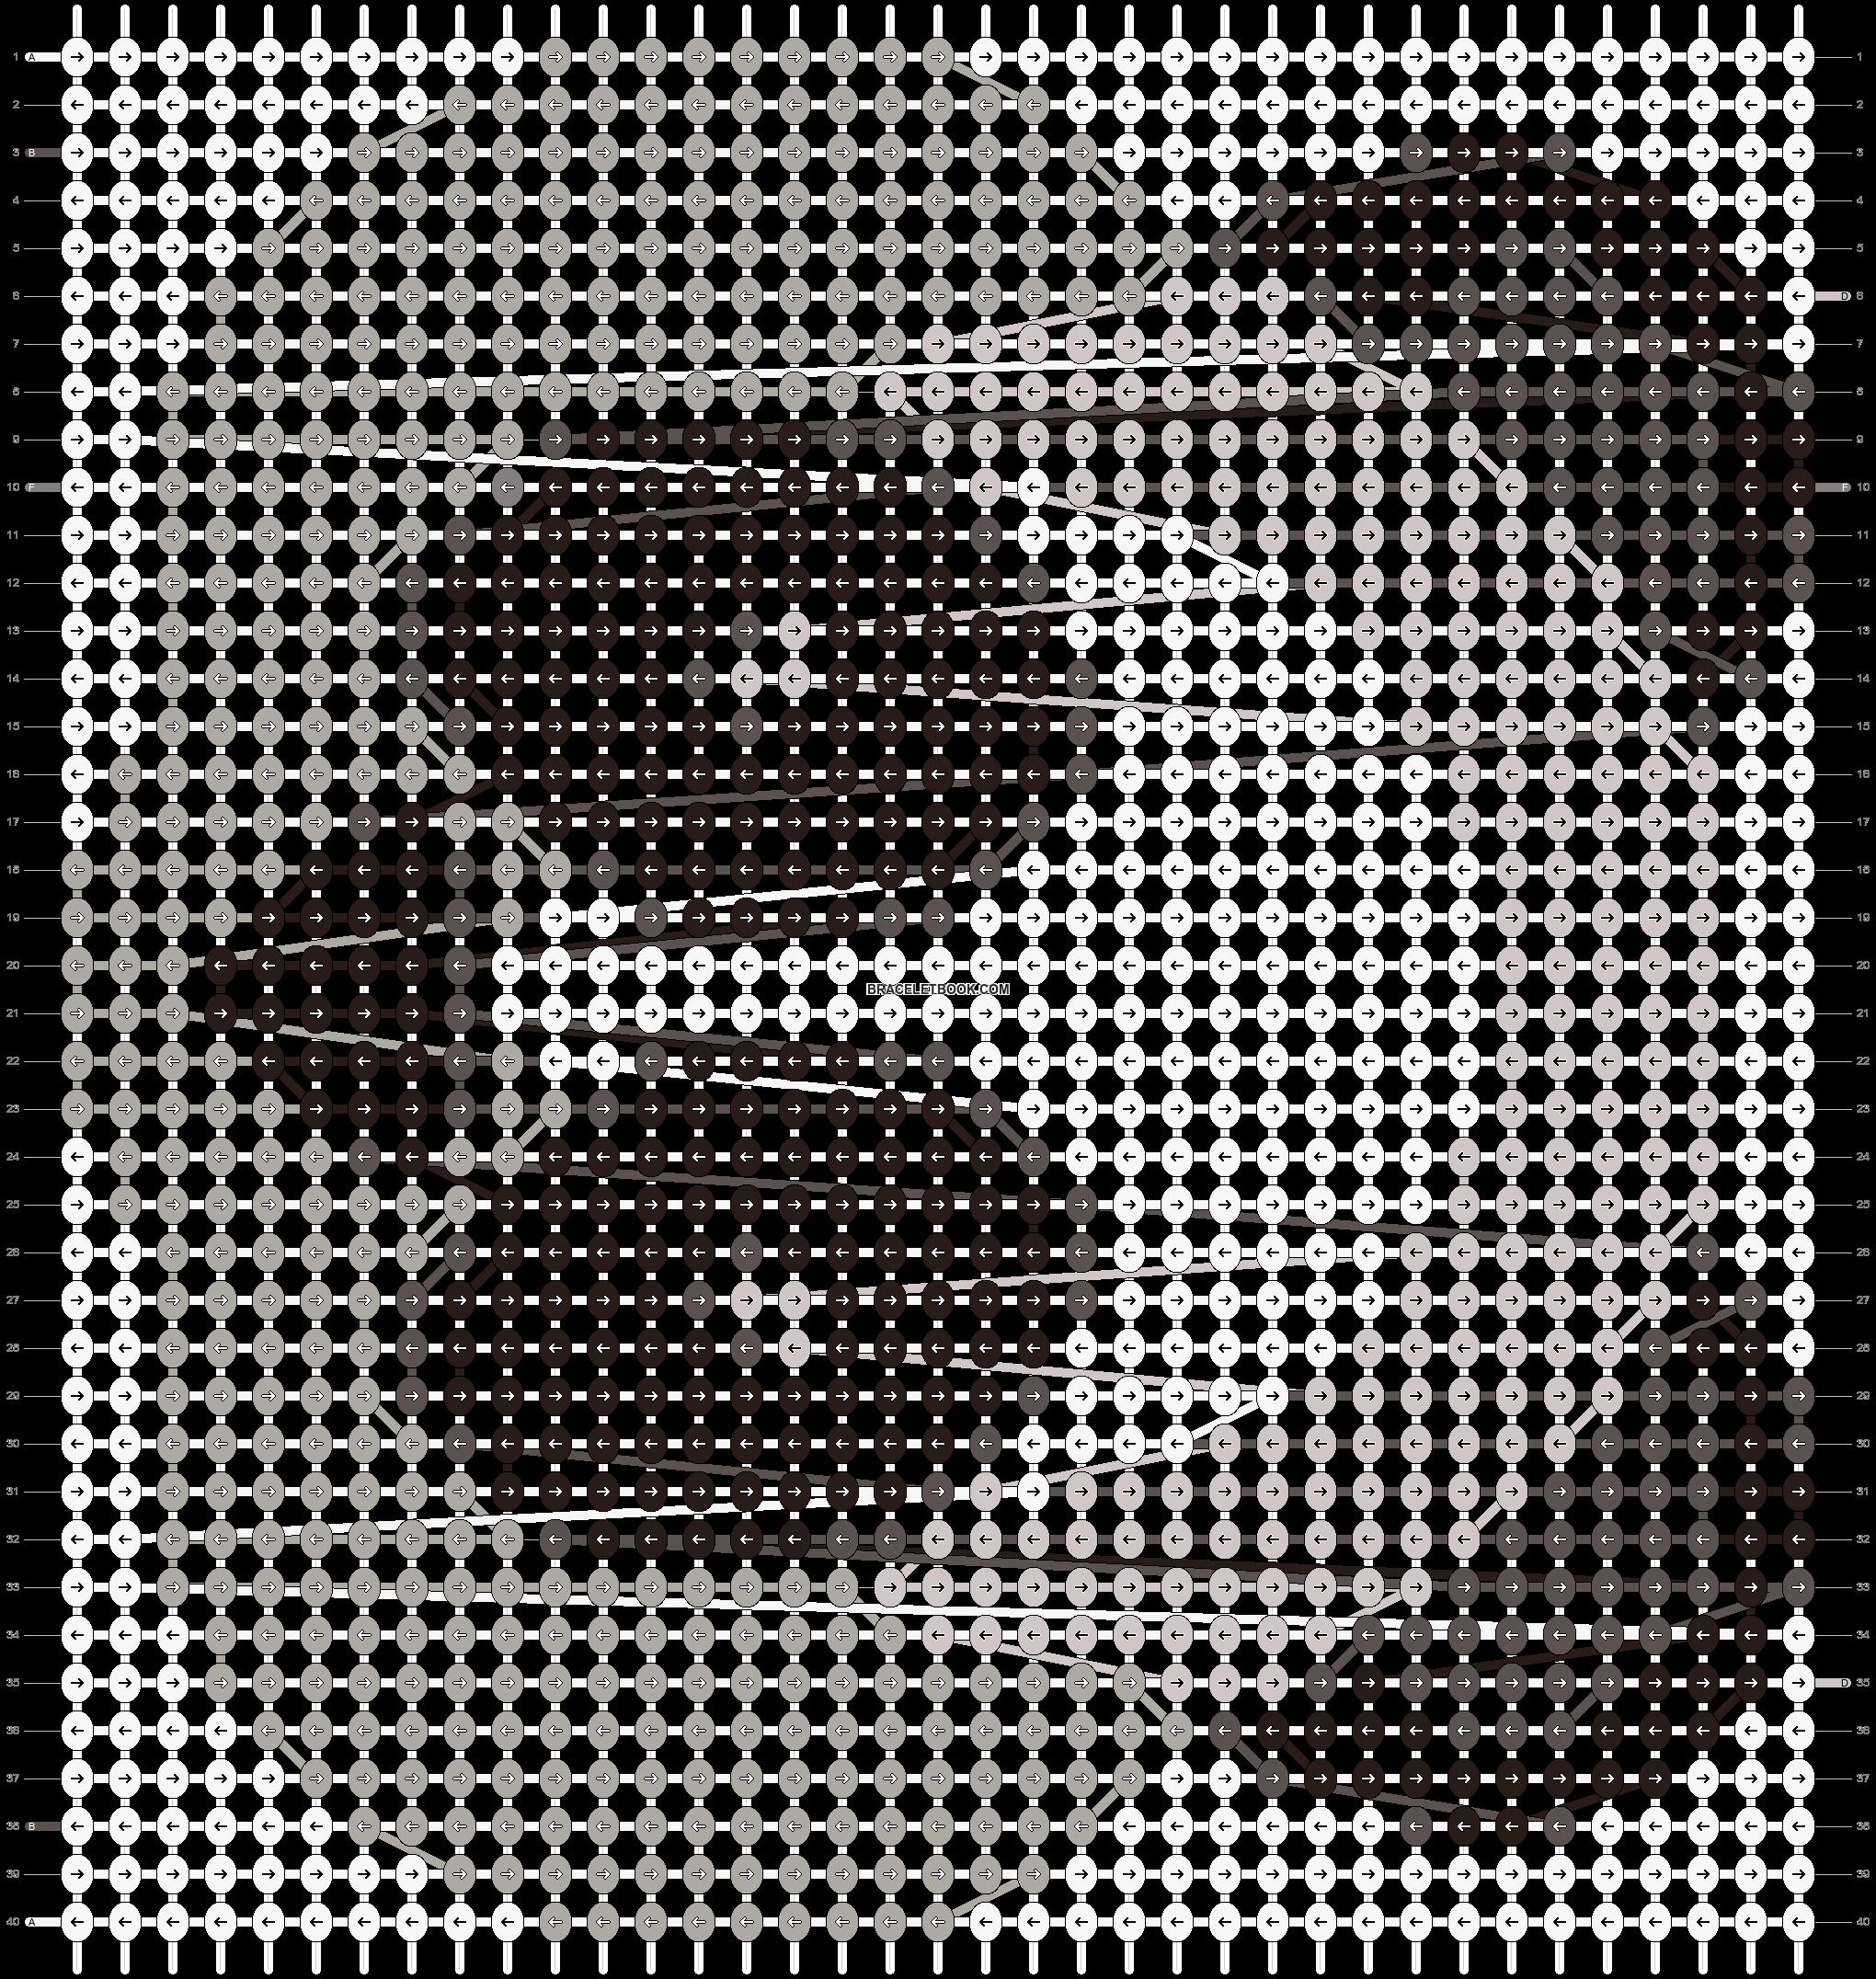 Alpha Pattern #21842 added by biancaplem